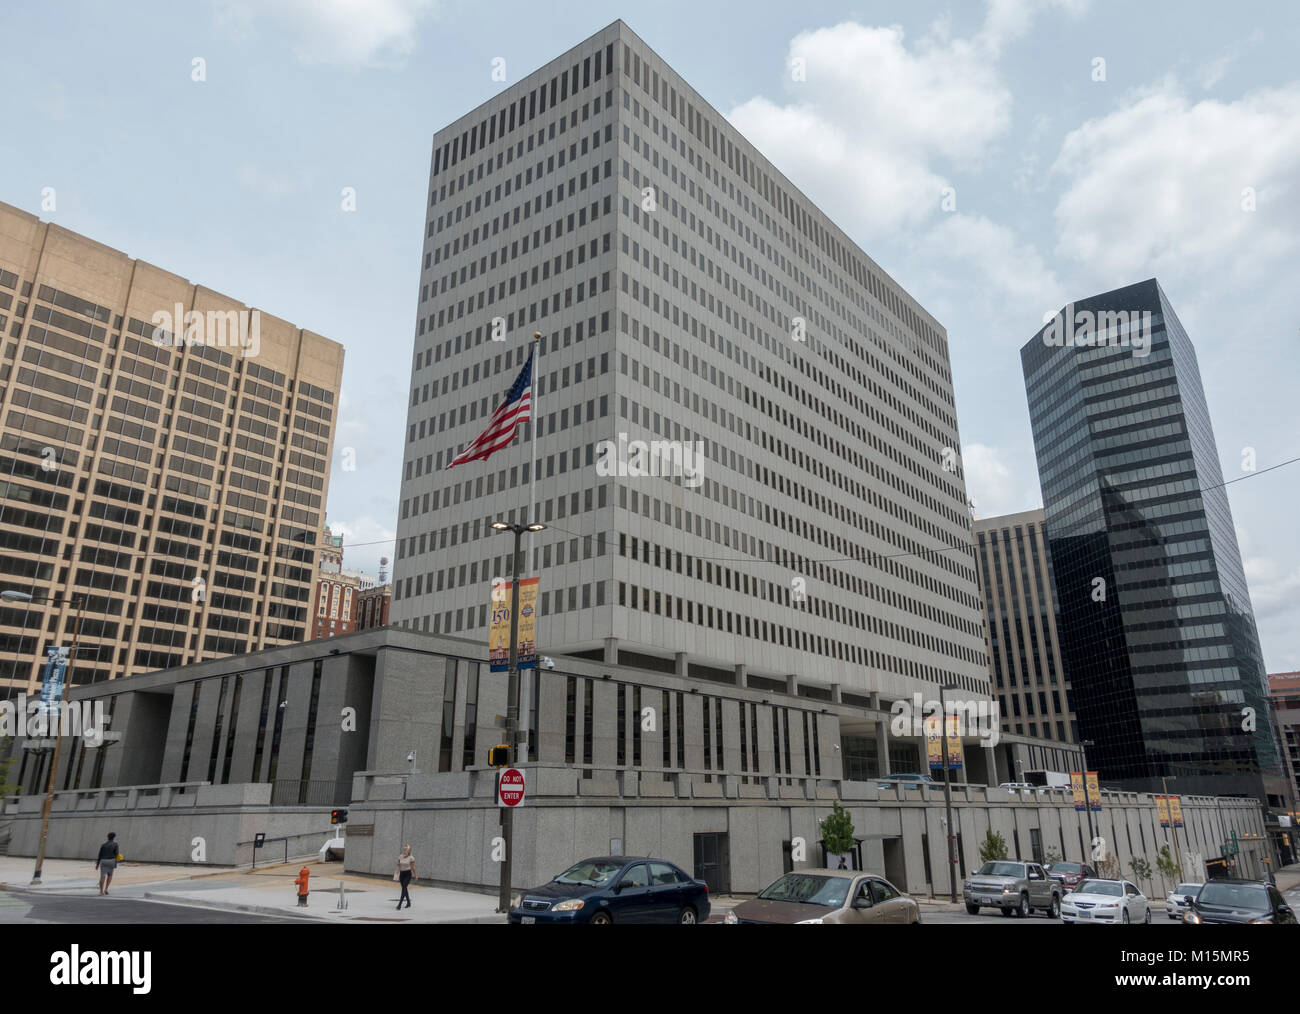 The CBRE Internal Revenue Service Building, 31 Hopkins Pl, Baltimore, Maryland, United States. - Stock Image